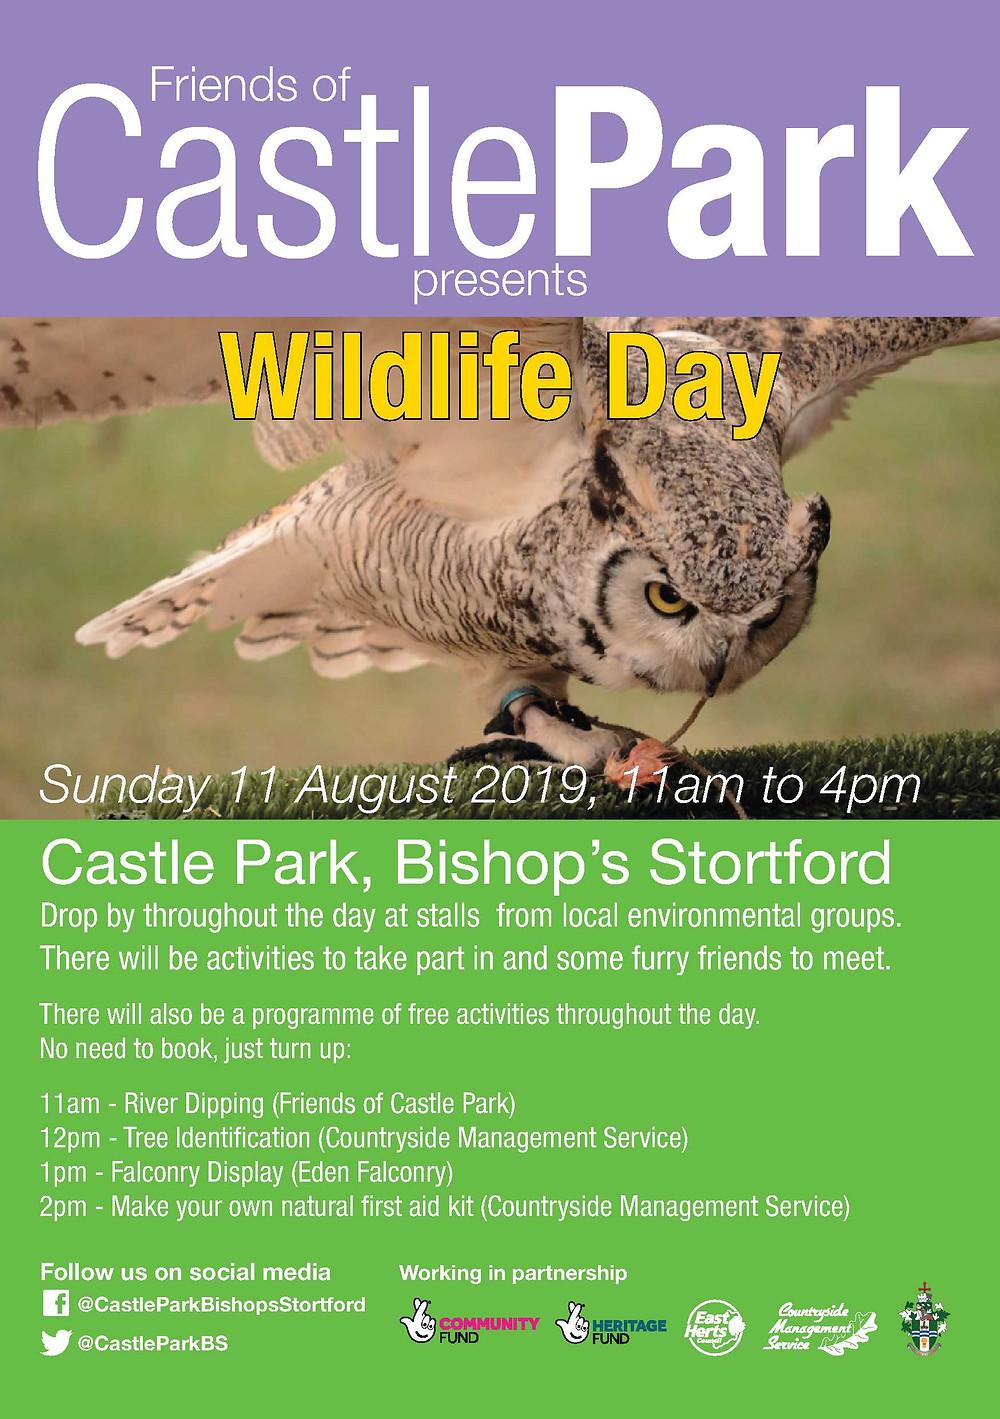 Wildlife Day At Castle Park In Bishops Stortford - 11th August 2019